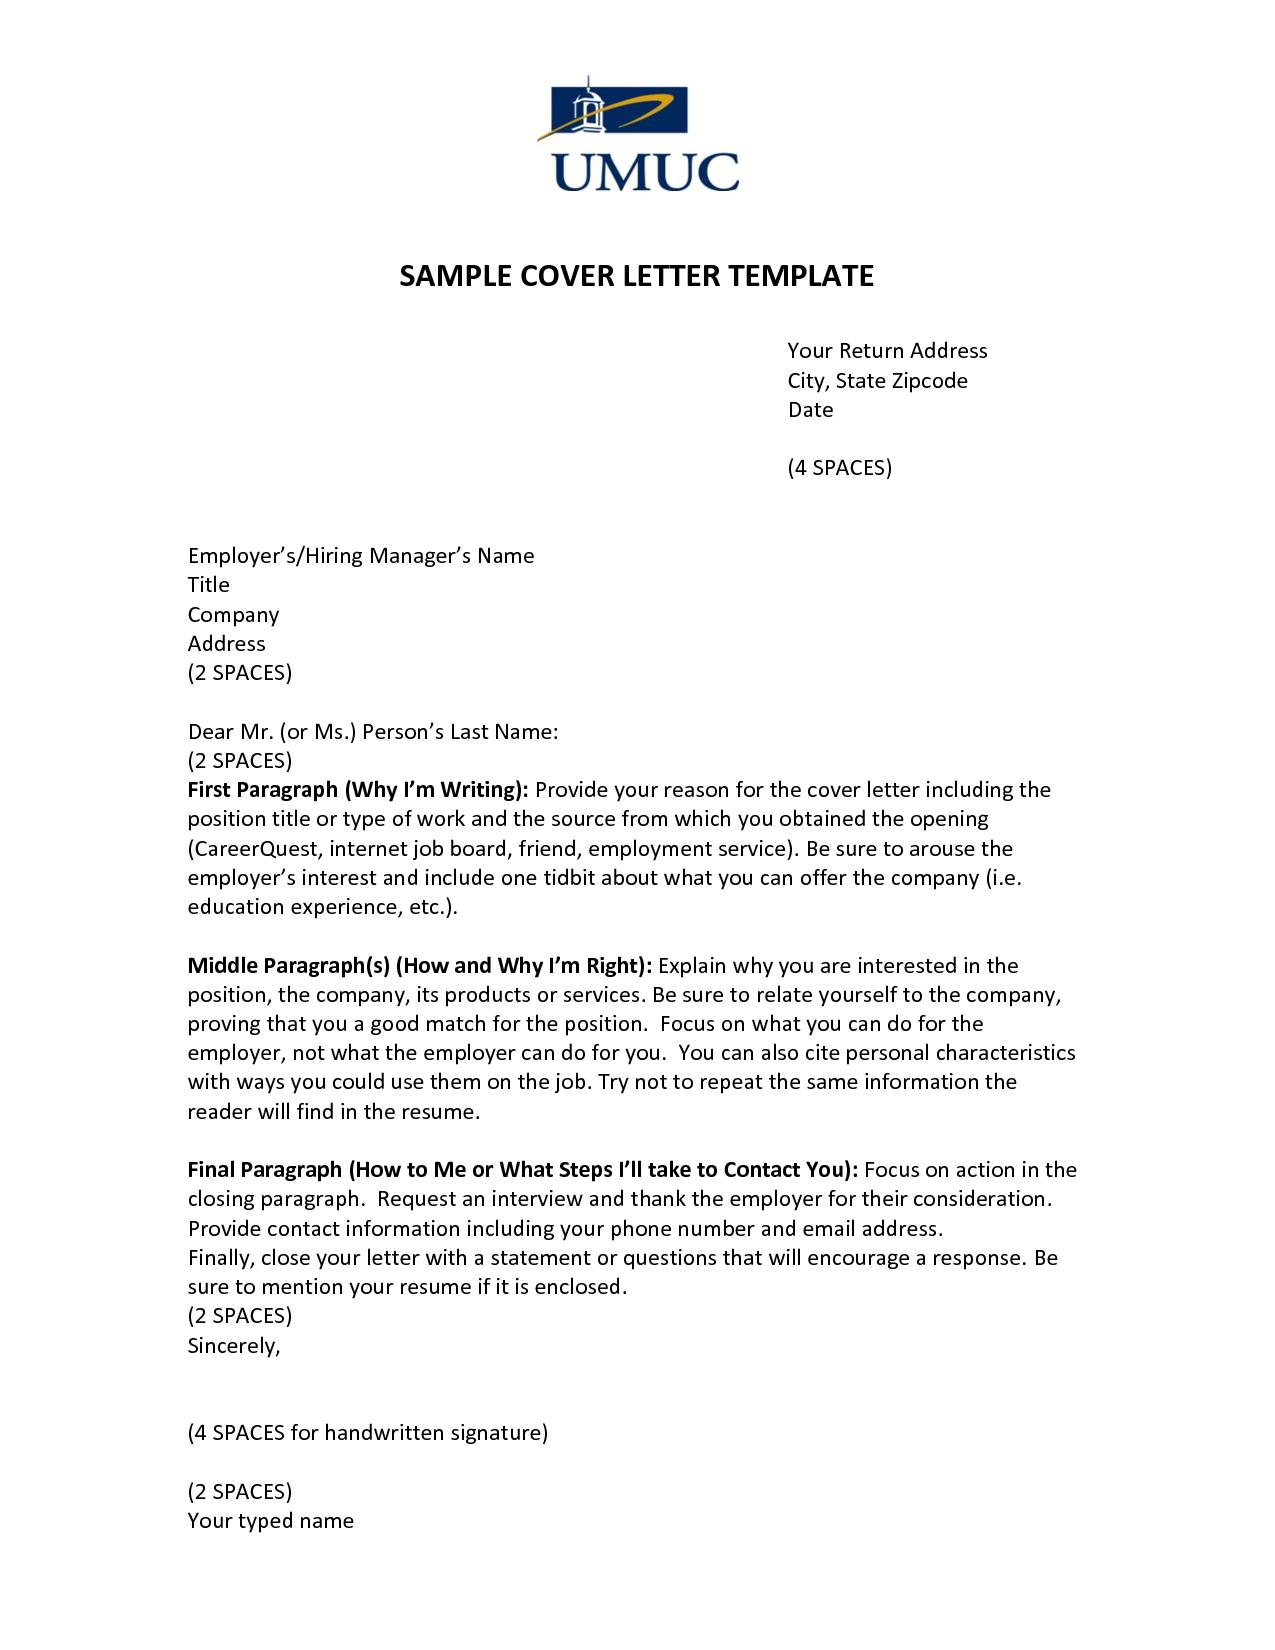 cover letter job in same company